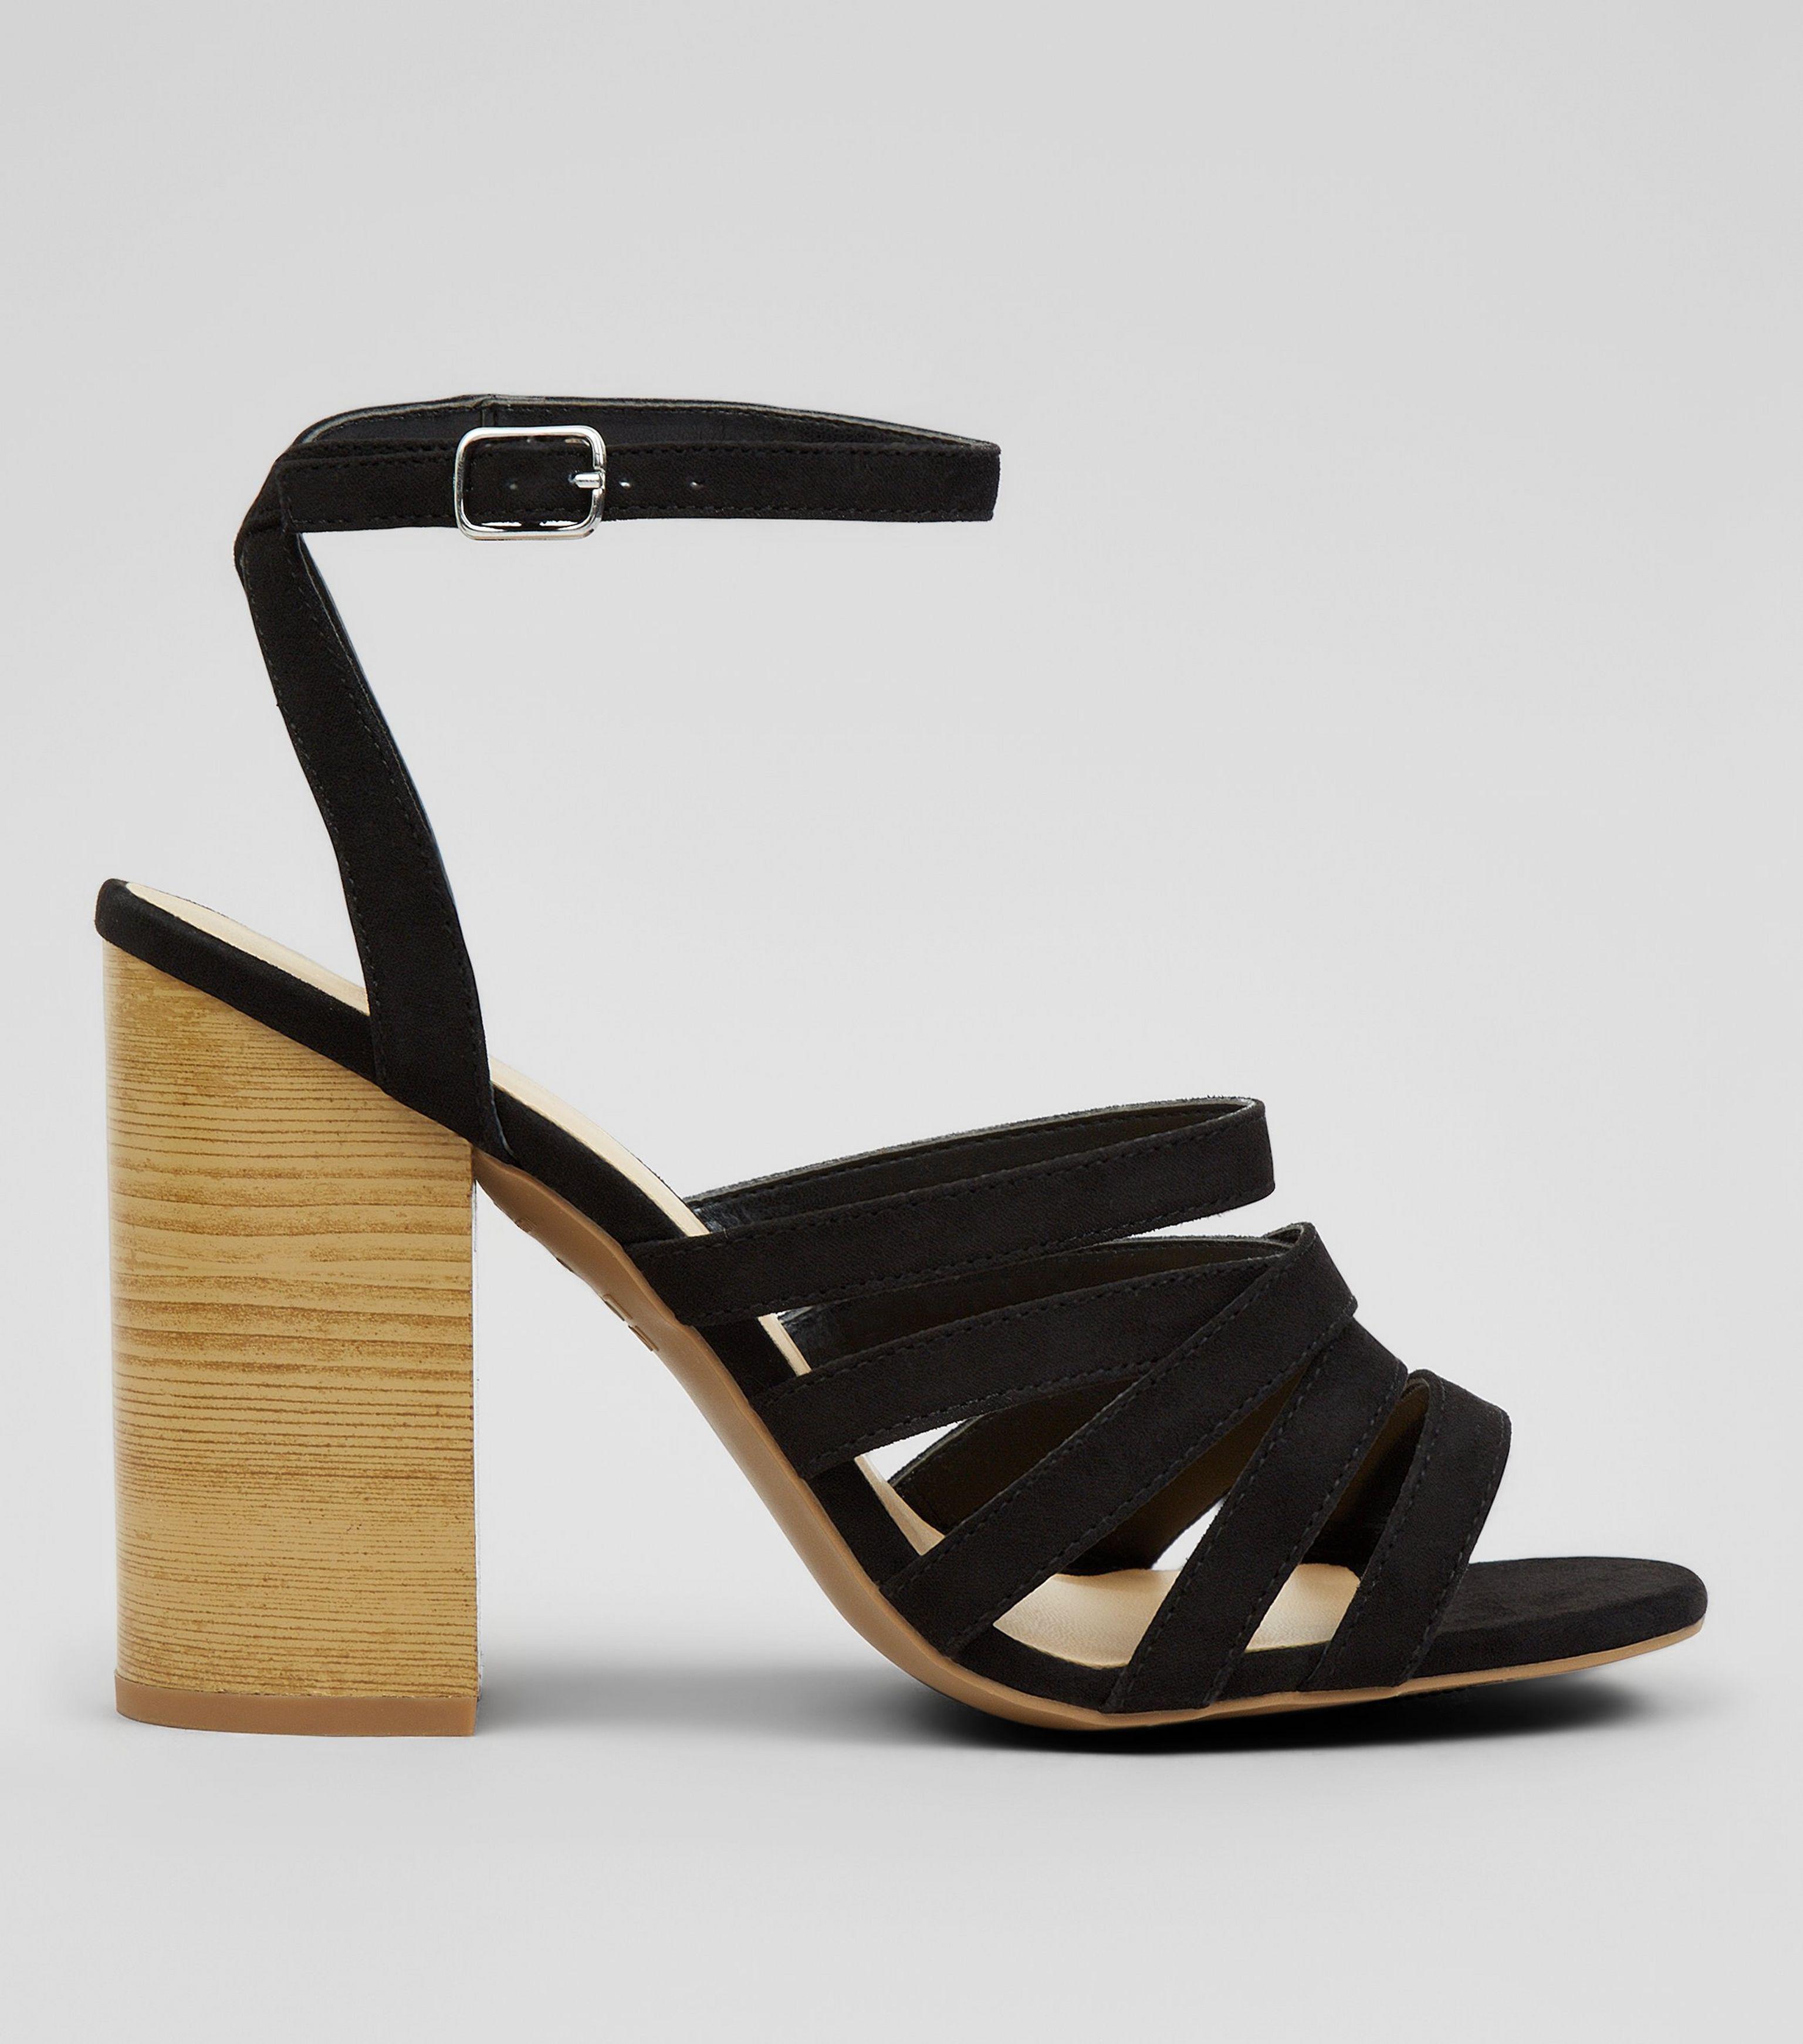 bbcdde56d45 New Look Black Multi Strap Wooden Block Heeled Sandals in Black - Lyst